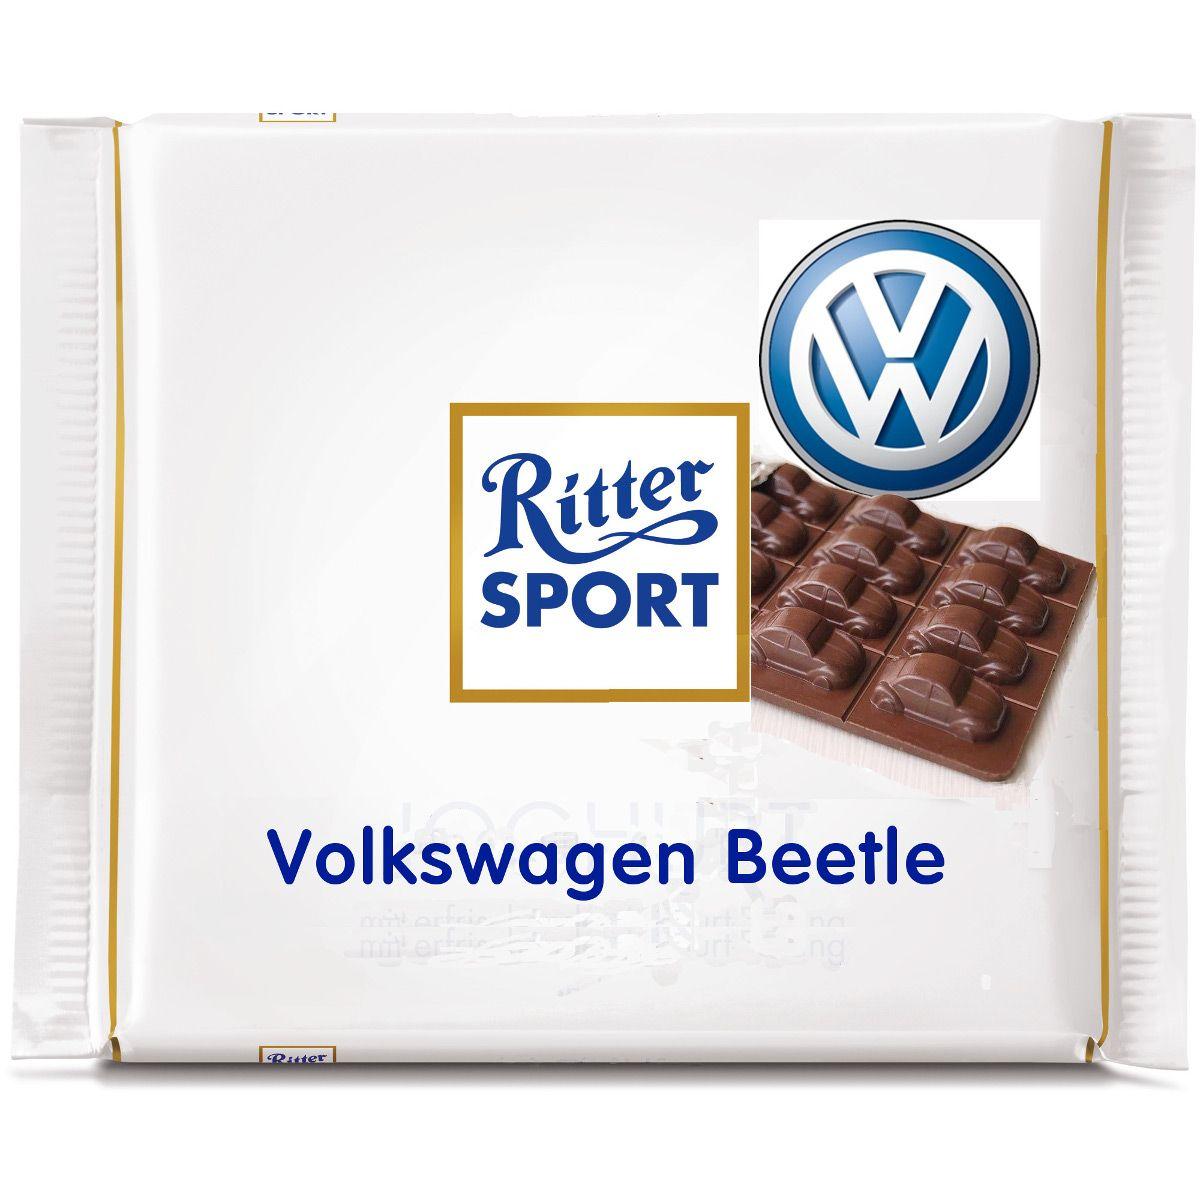 Ritter Sport Fake Sorte - VW Beetle   Ritter sport ...